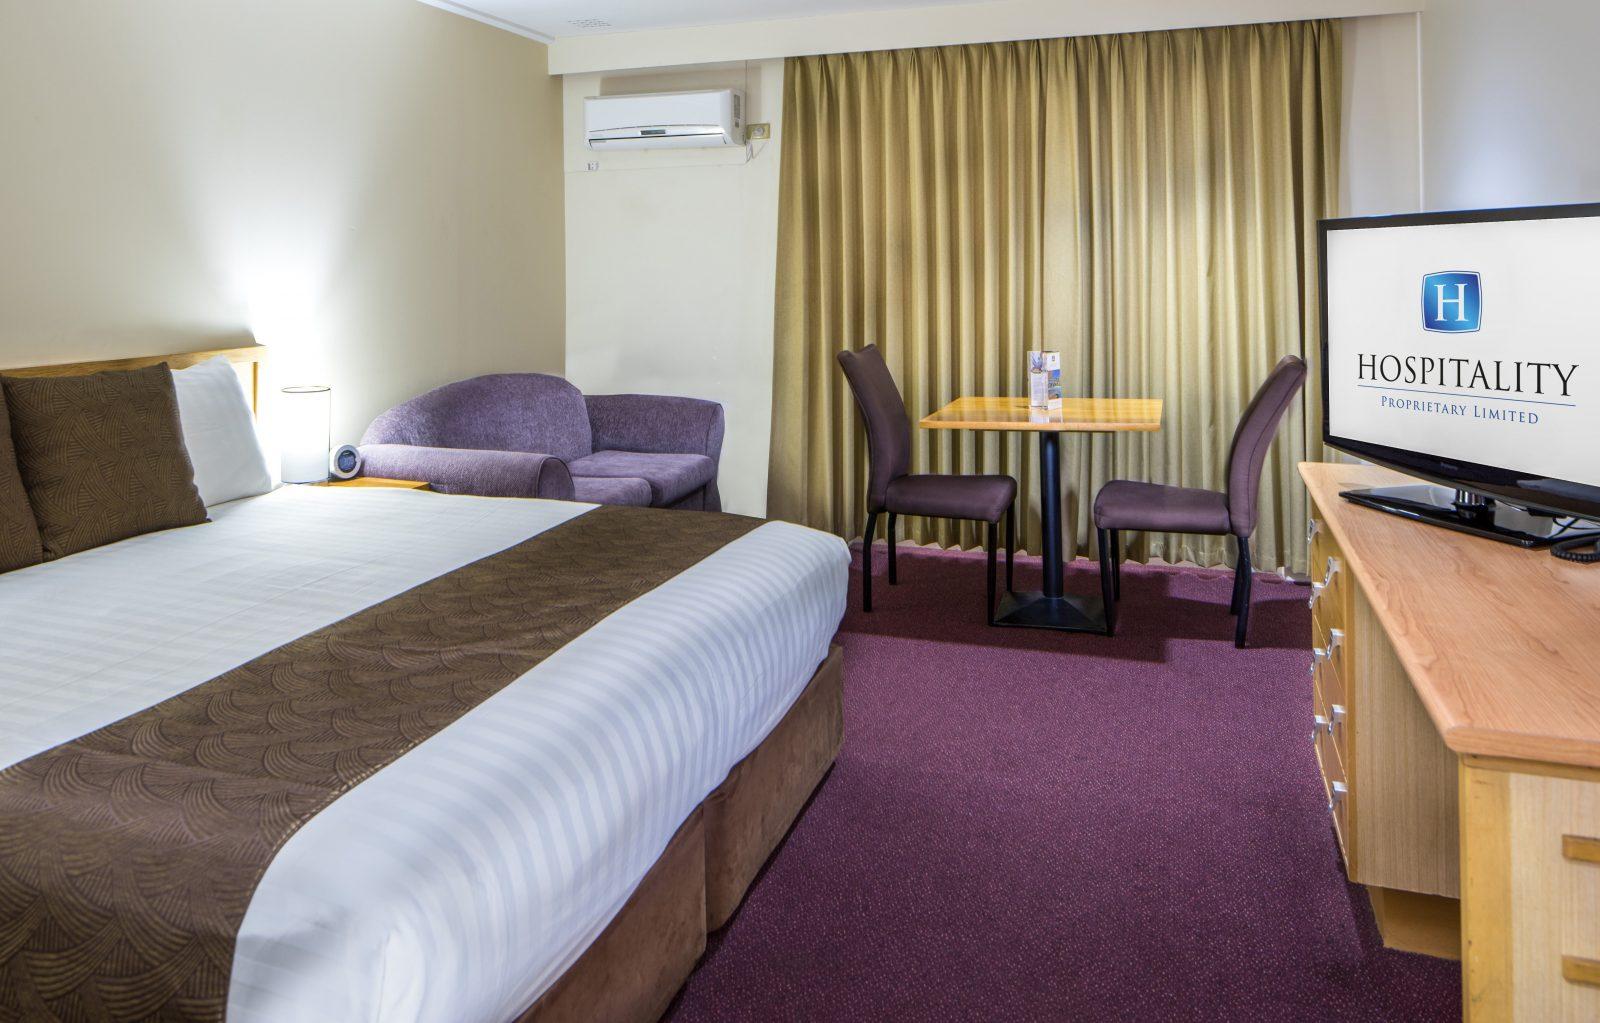 Hospitality Geraldton, SureStay Collection by Best Western, Geraldton, Western Australia